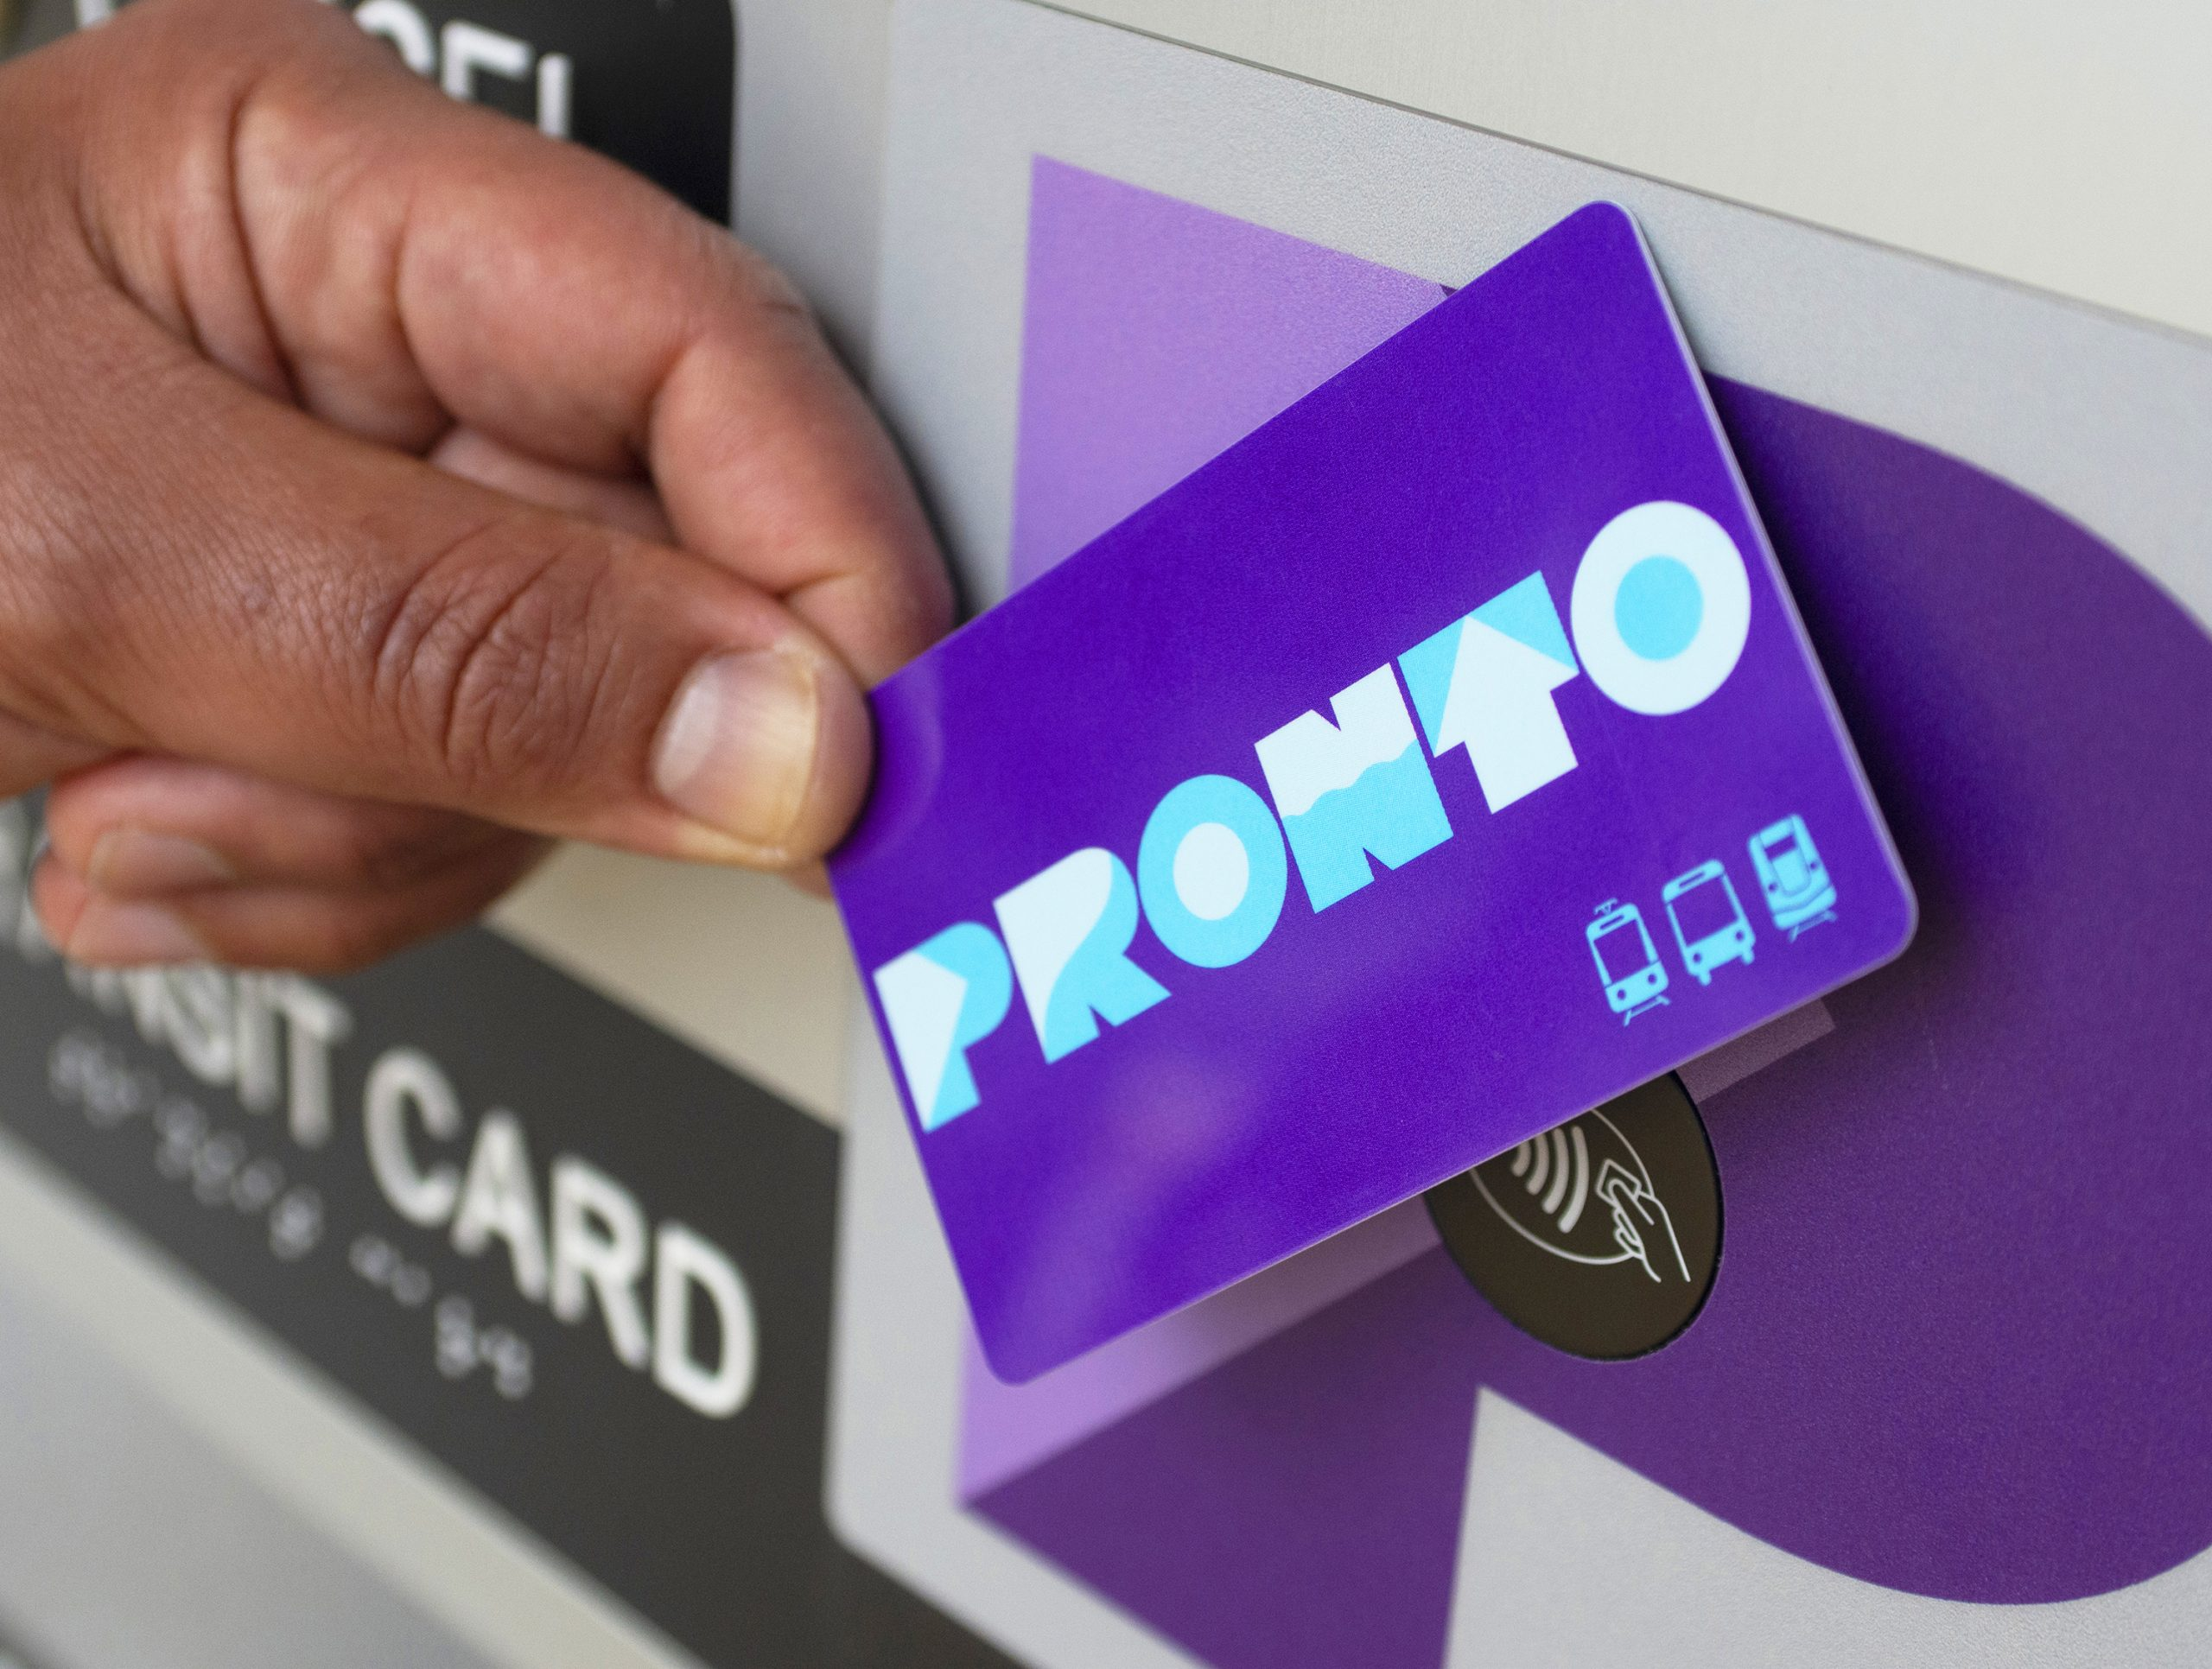 pronto card